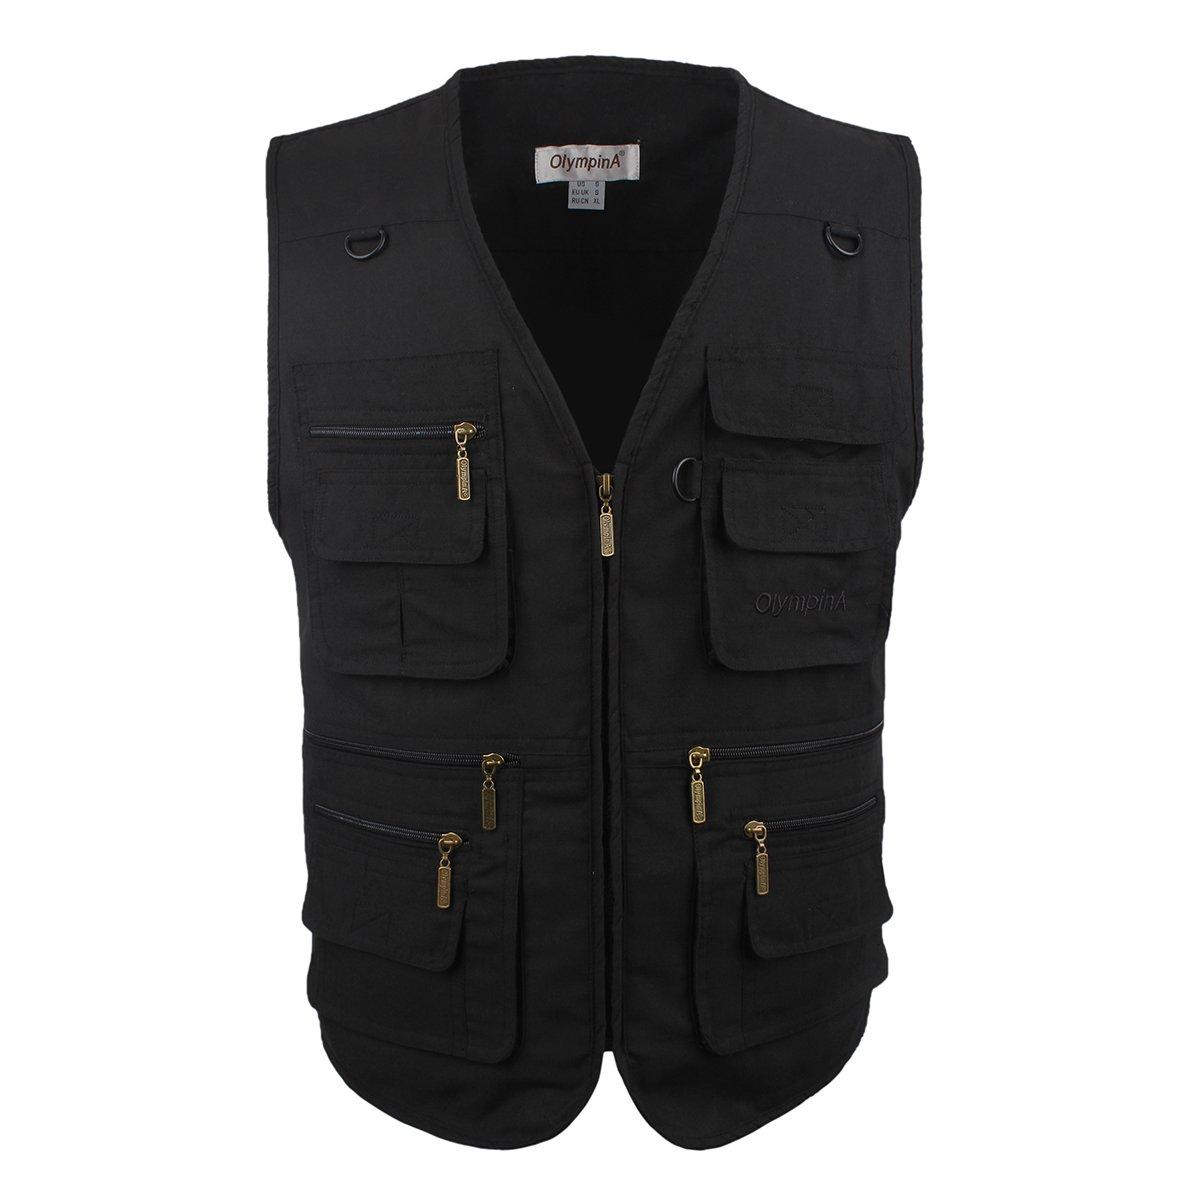 LUSI MADAM Men's Outdoors Travel Sports Pockets Vest (Black, US S/Asia XL)